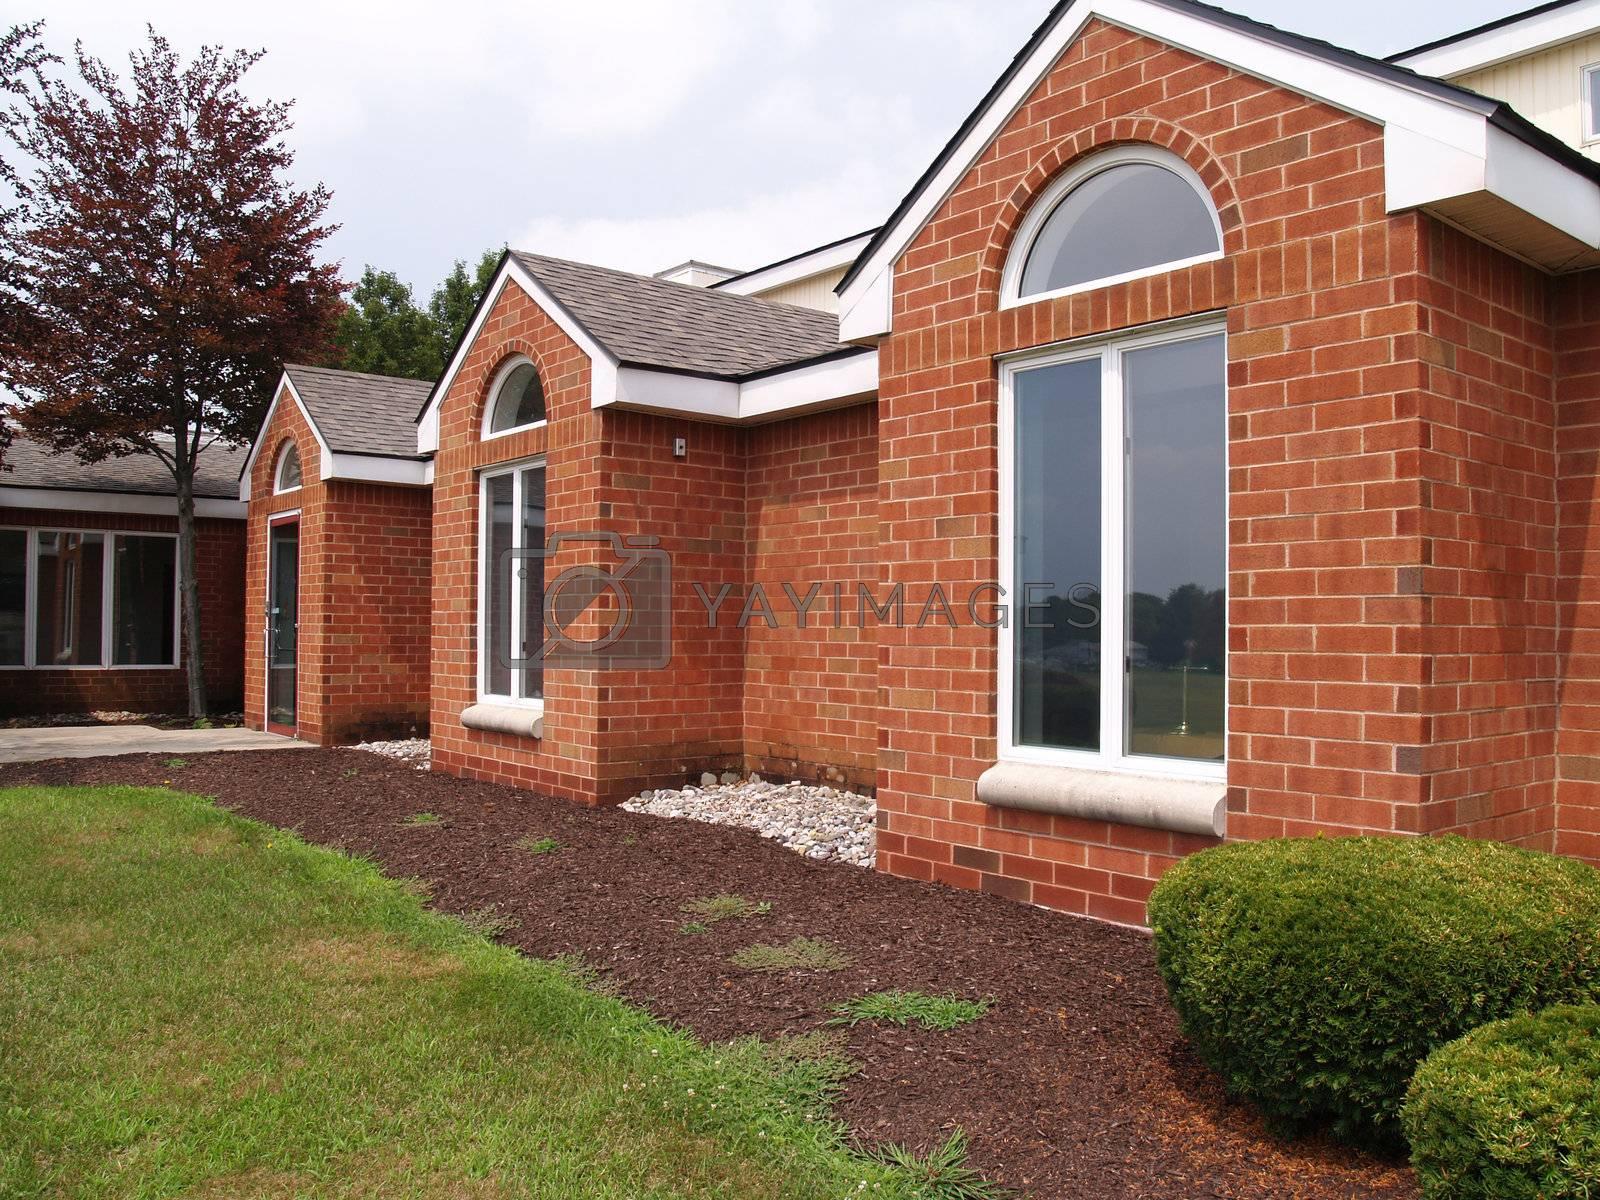 Royalty free image of modern windows on a brick building by cfarmer